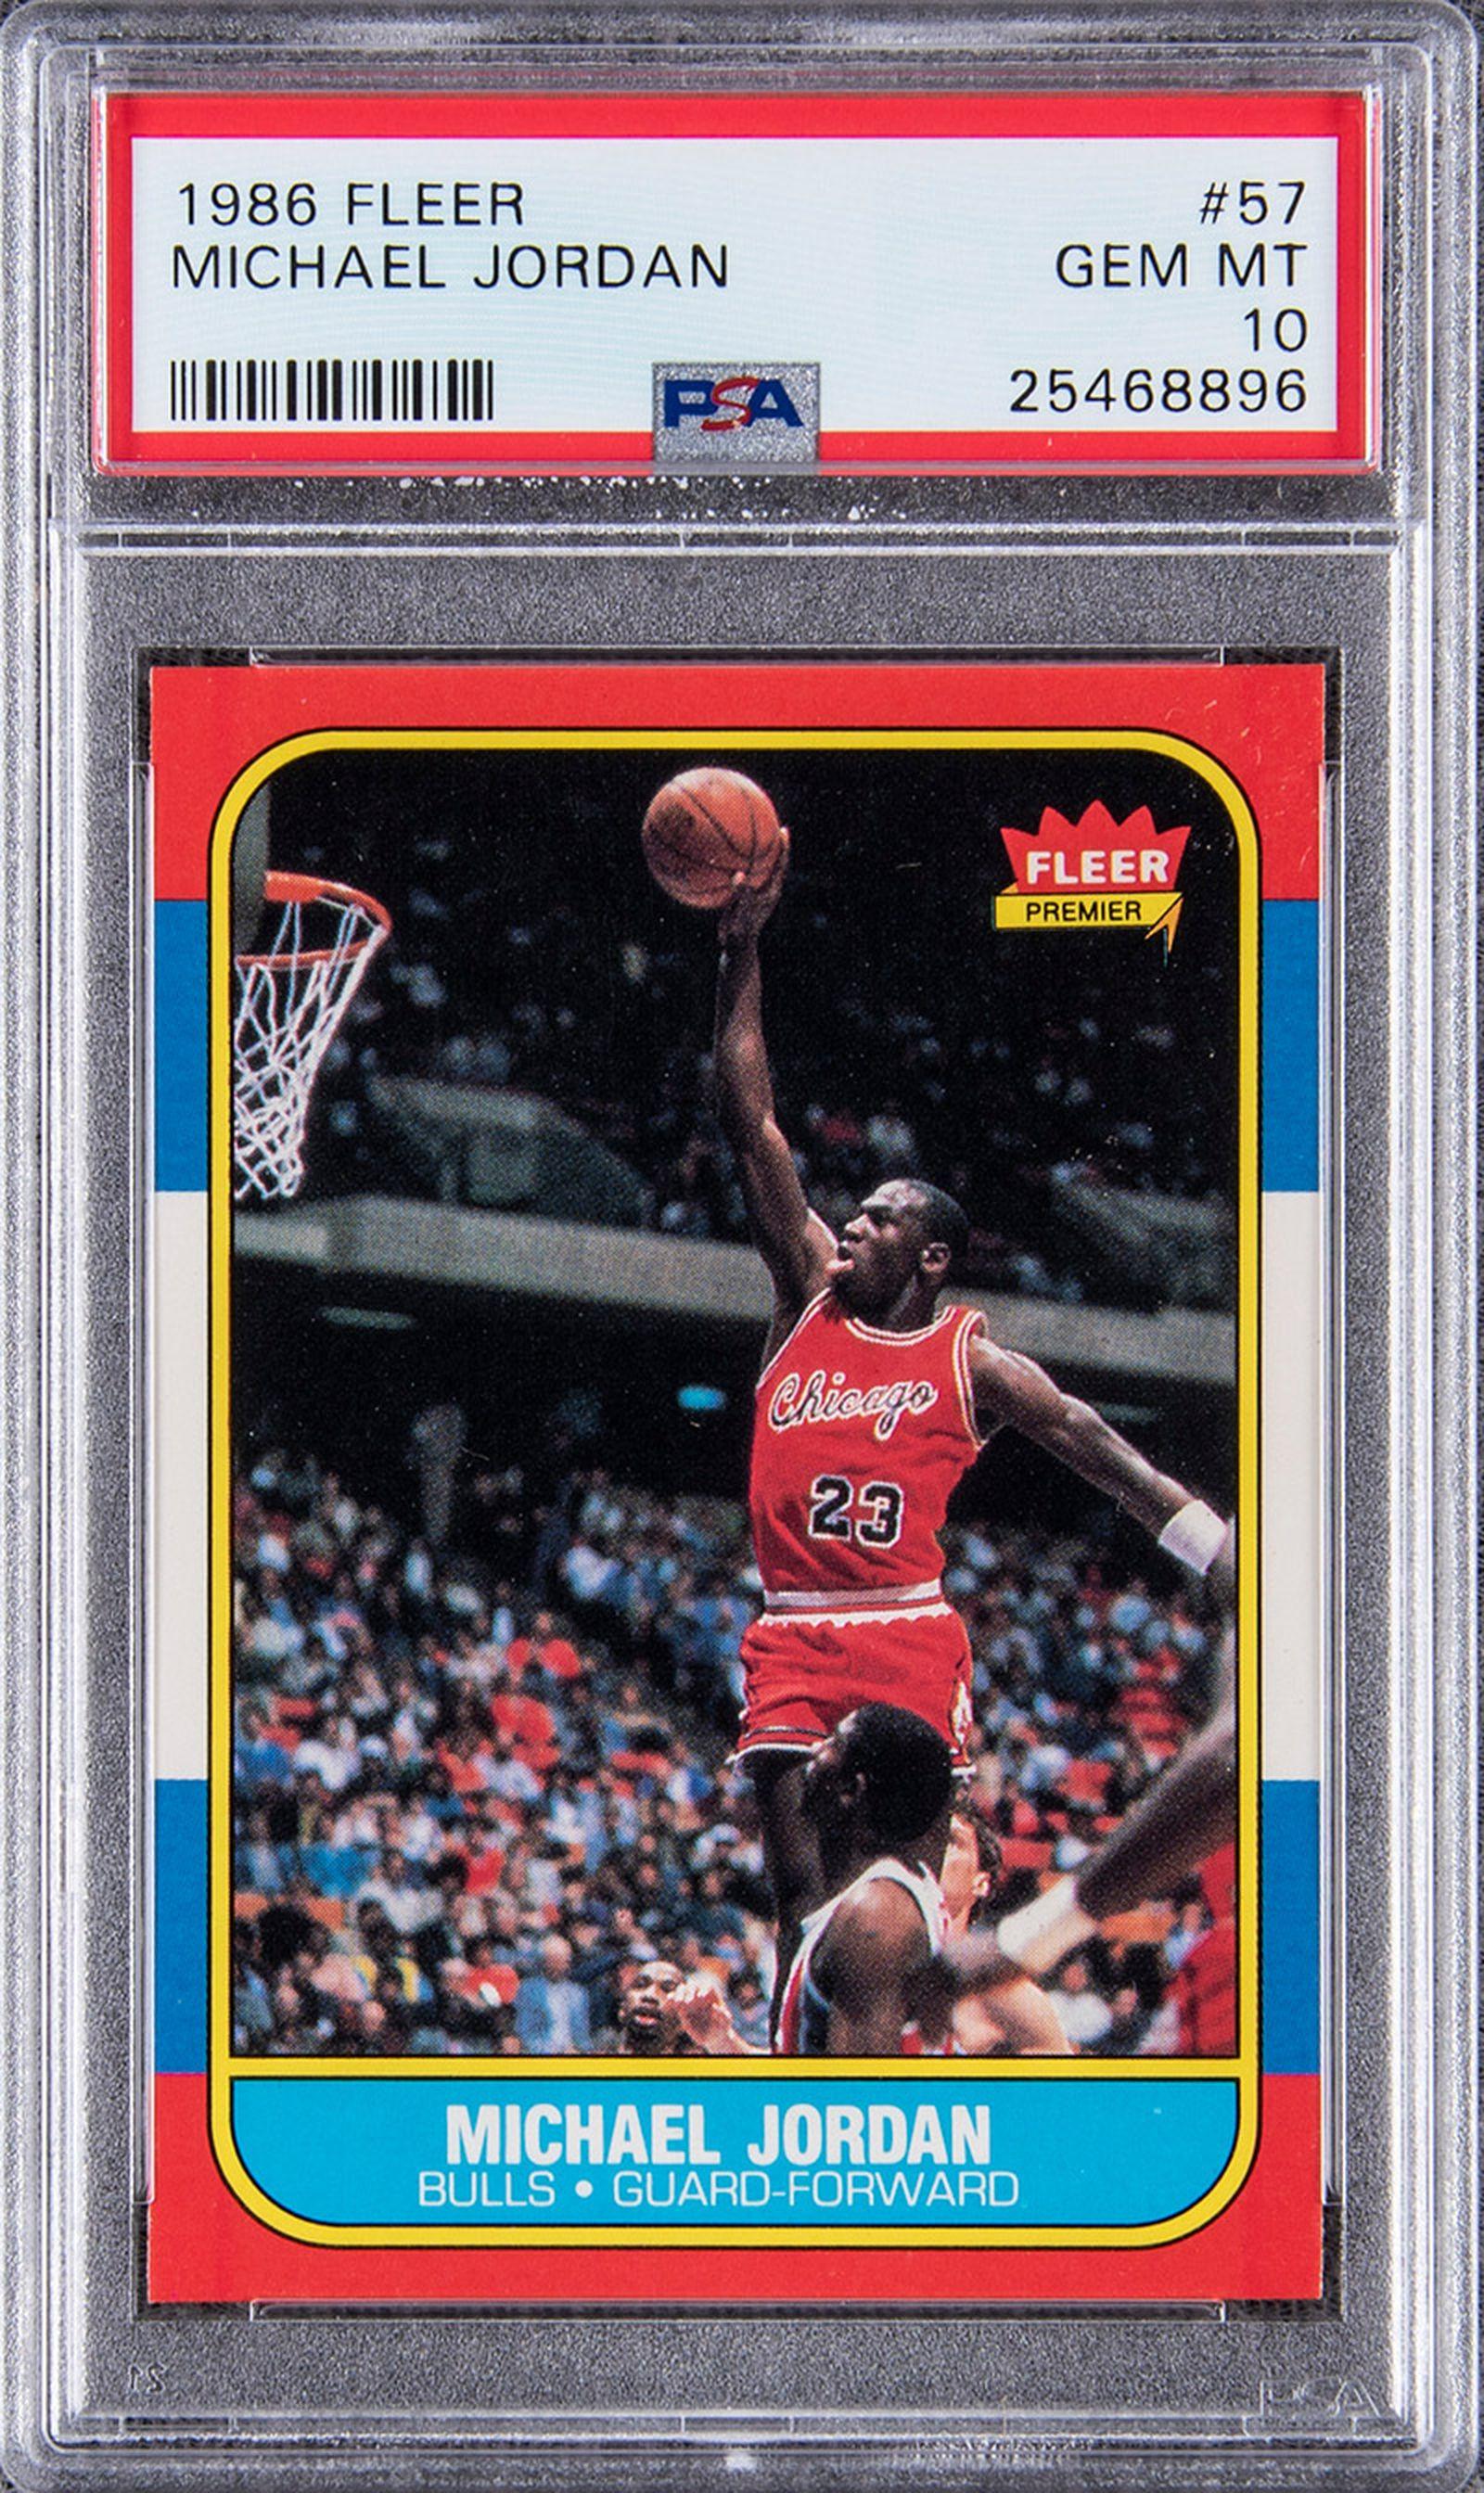 michael-jordan-rookie-card-sets-auction-record-01